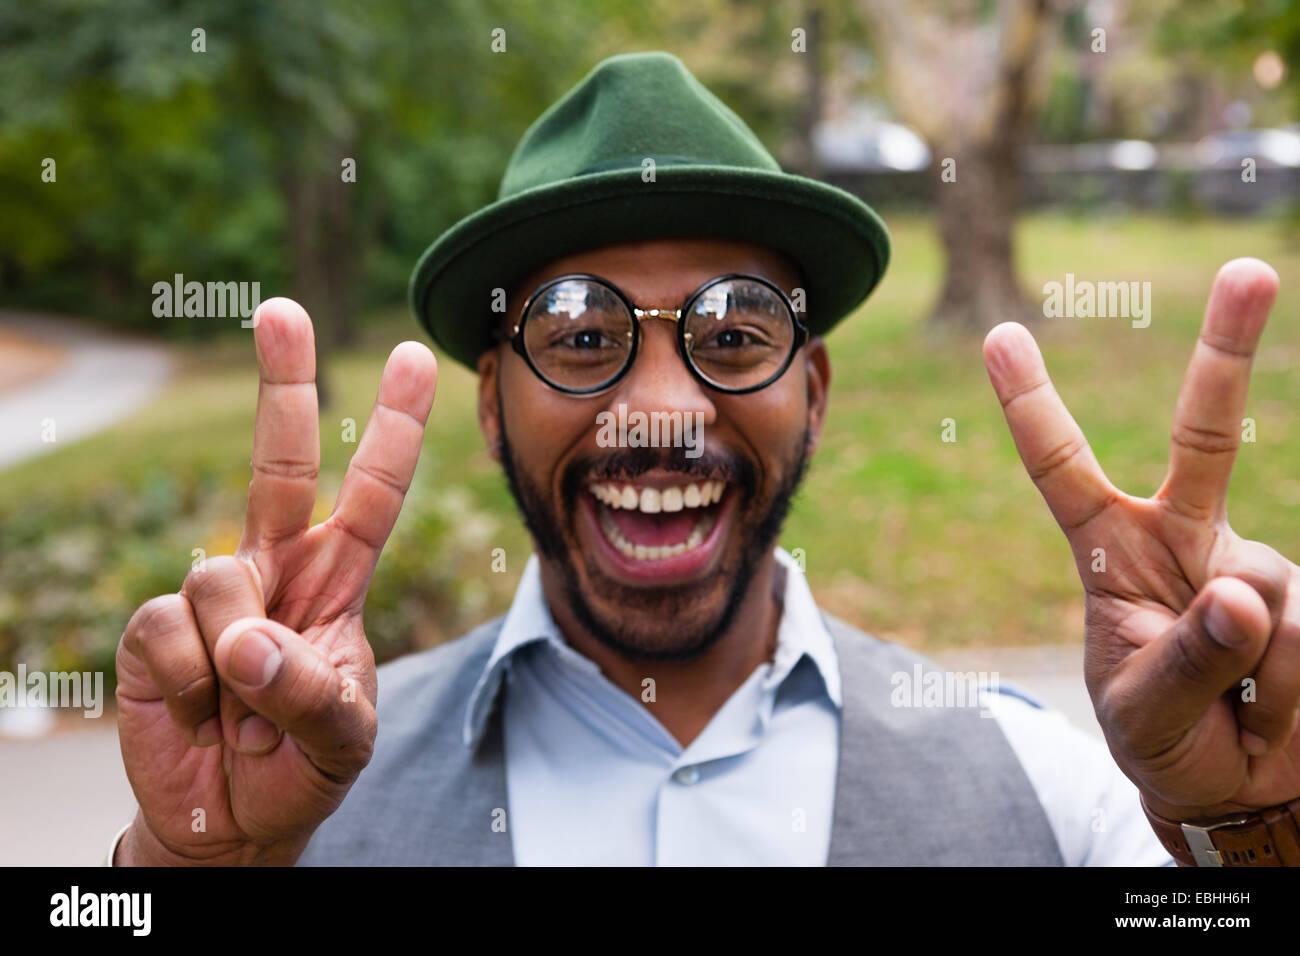 Man making peace sign smiling largement dans park Photo Stock